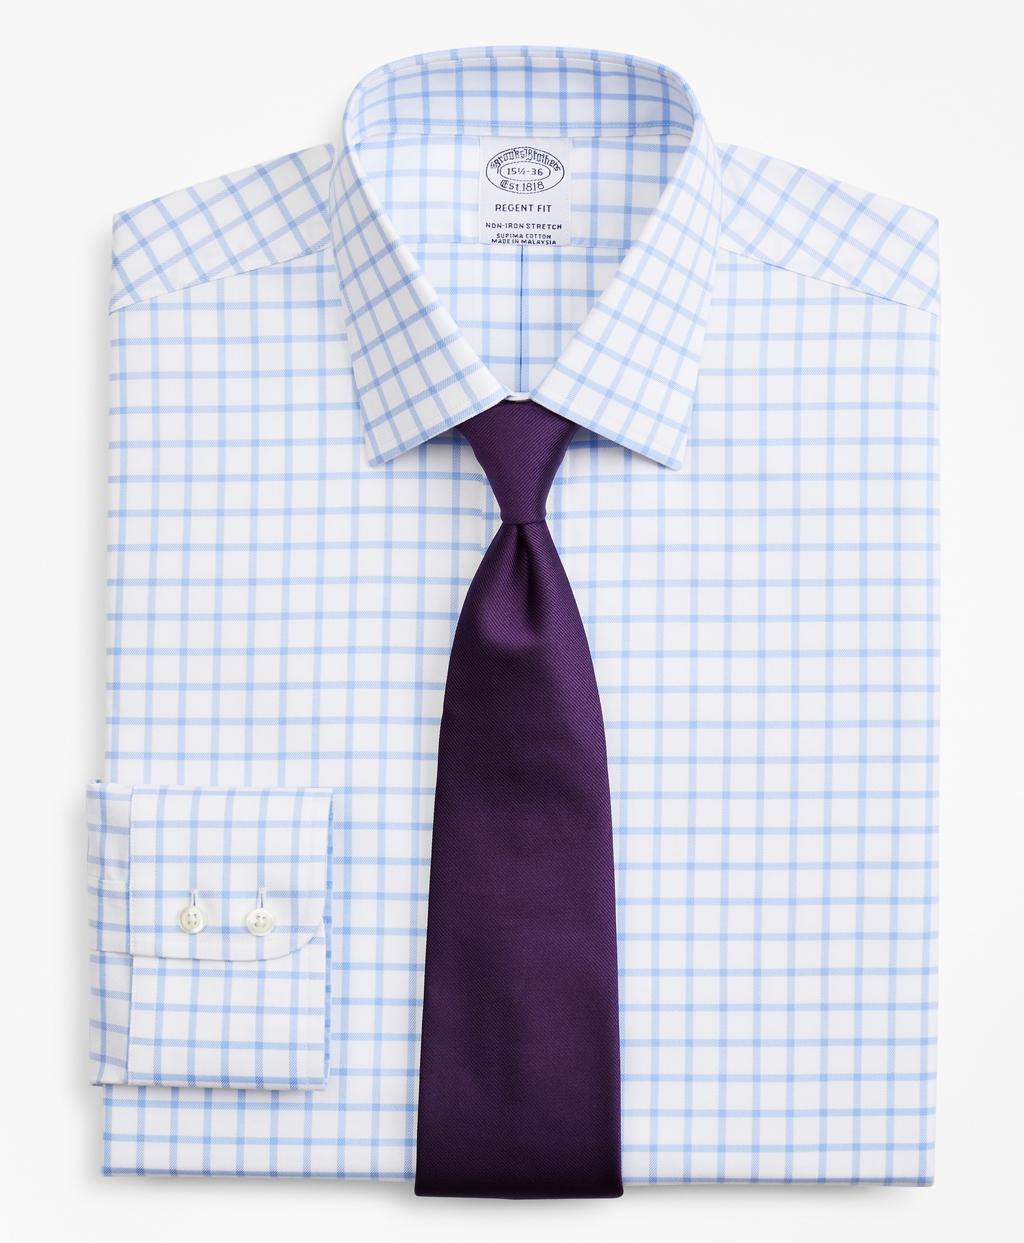 Brooksbrothers Stretch Regent Regular-Fit Dress Shirt, Non-Iron Twill Ainsley Collar Grid Check